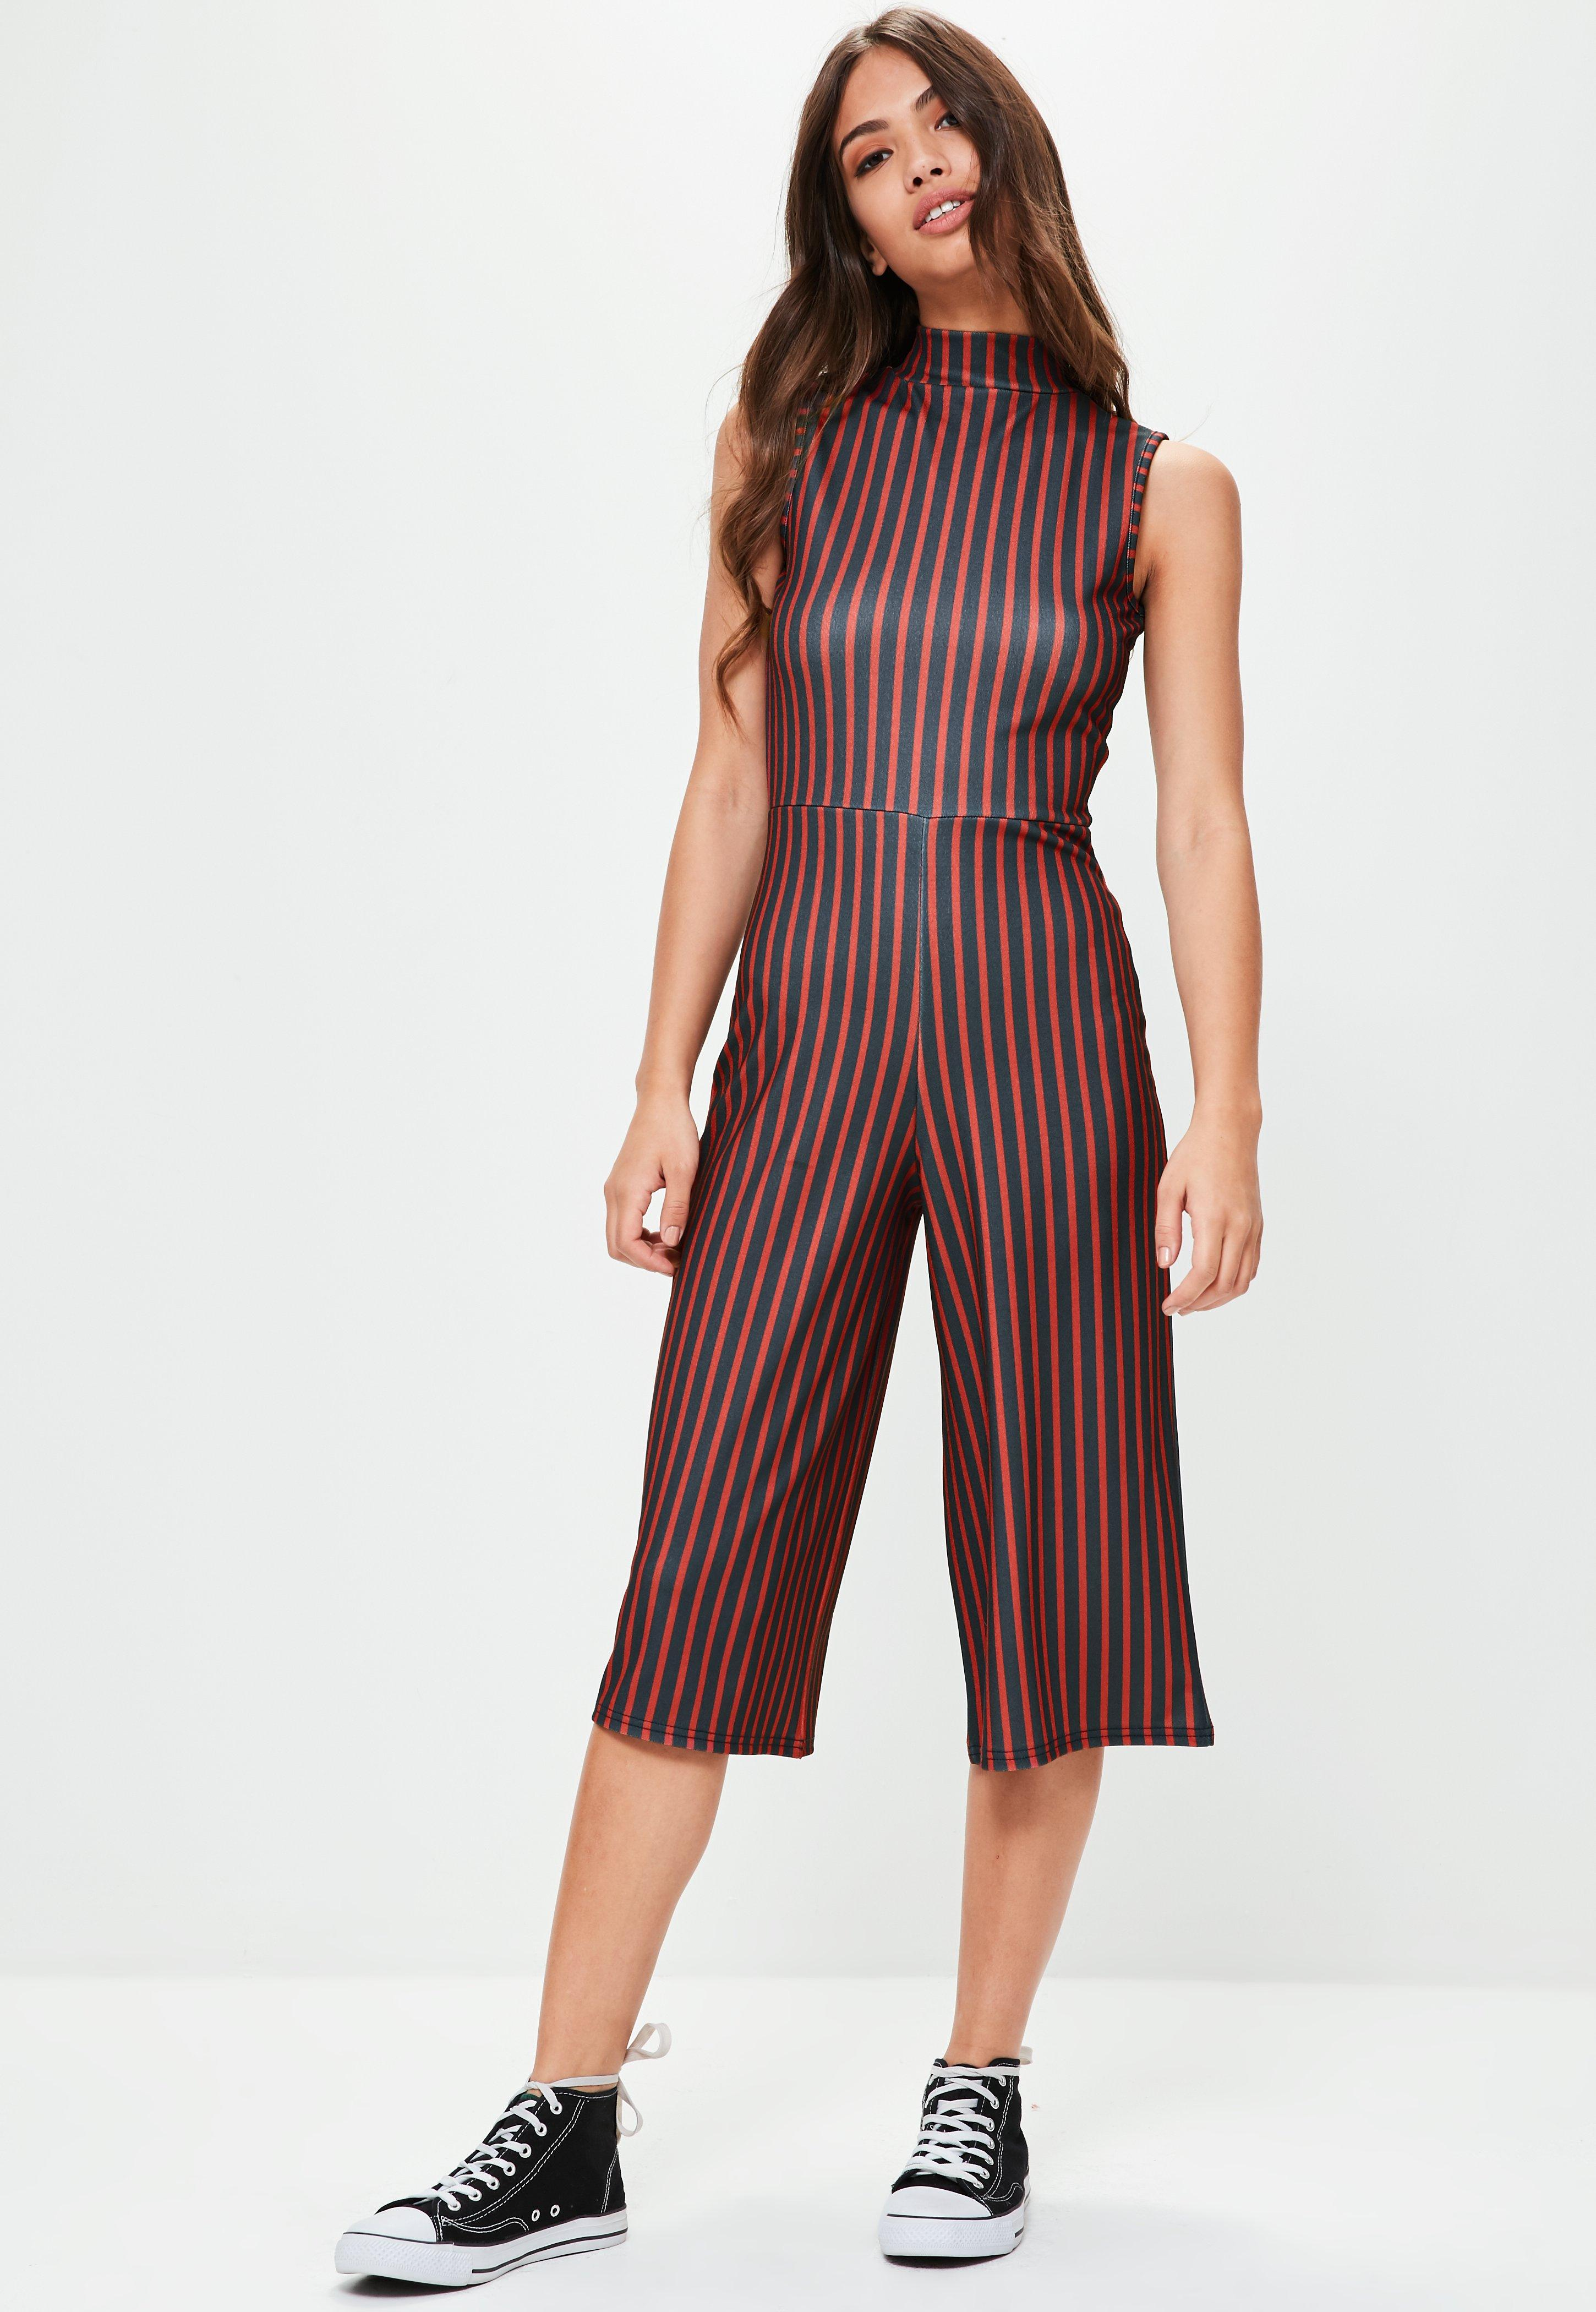 0b95166605d Lyst - Missguided Black High Neck Striped Culotte Jumpsuit in Black